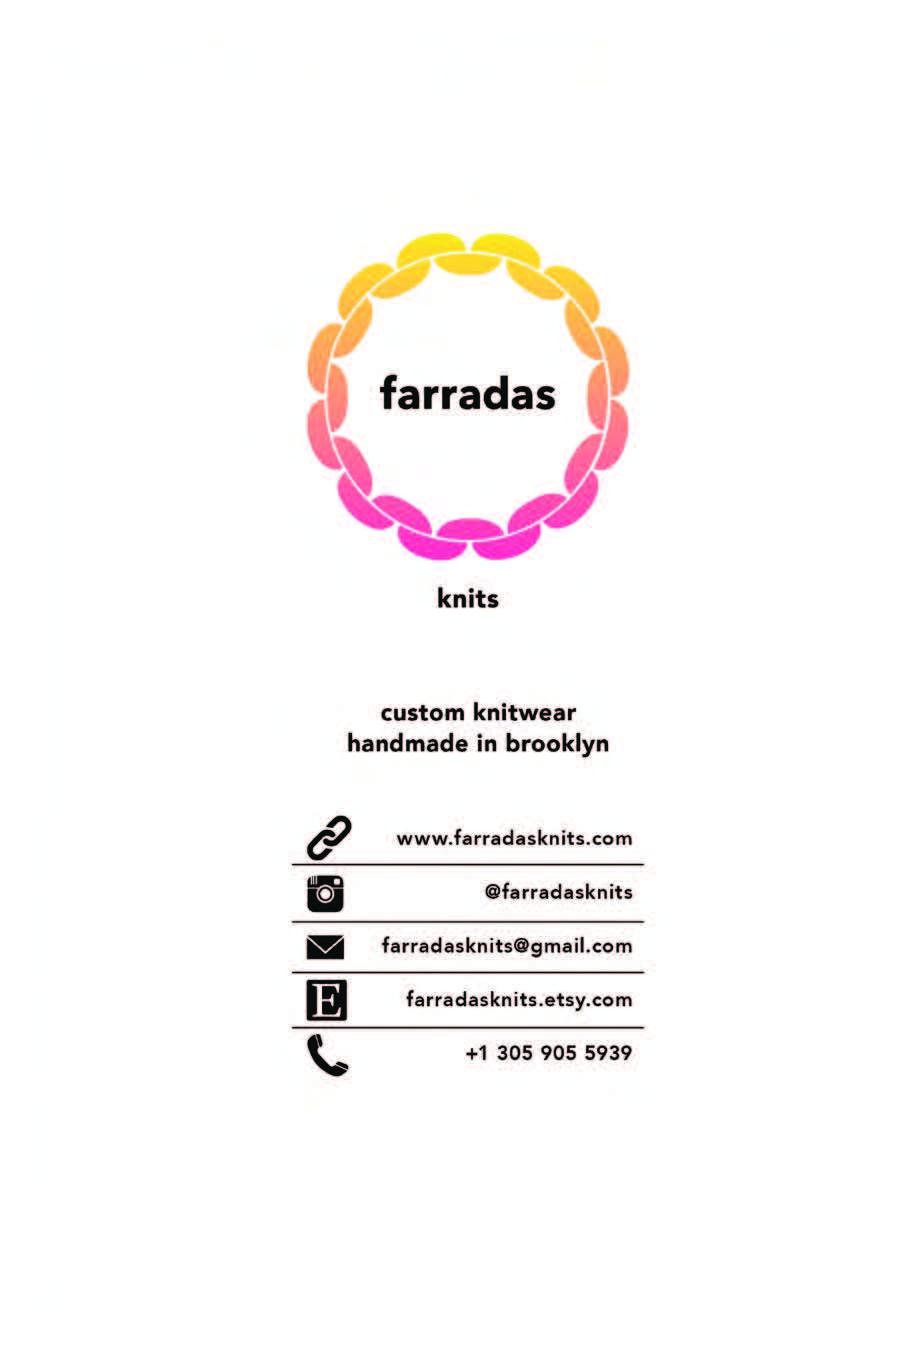 -FarradasKnitsLookBookss17 copy_Page_8.jpg